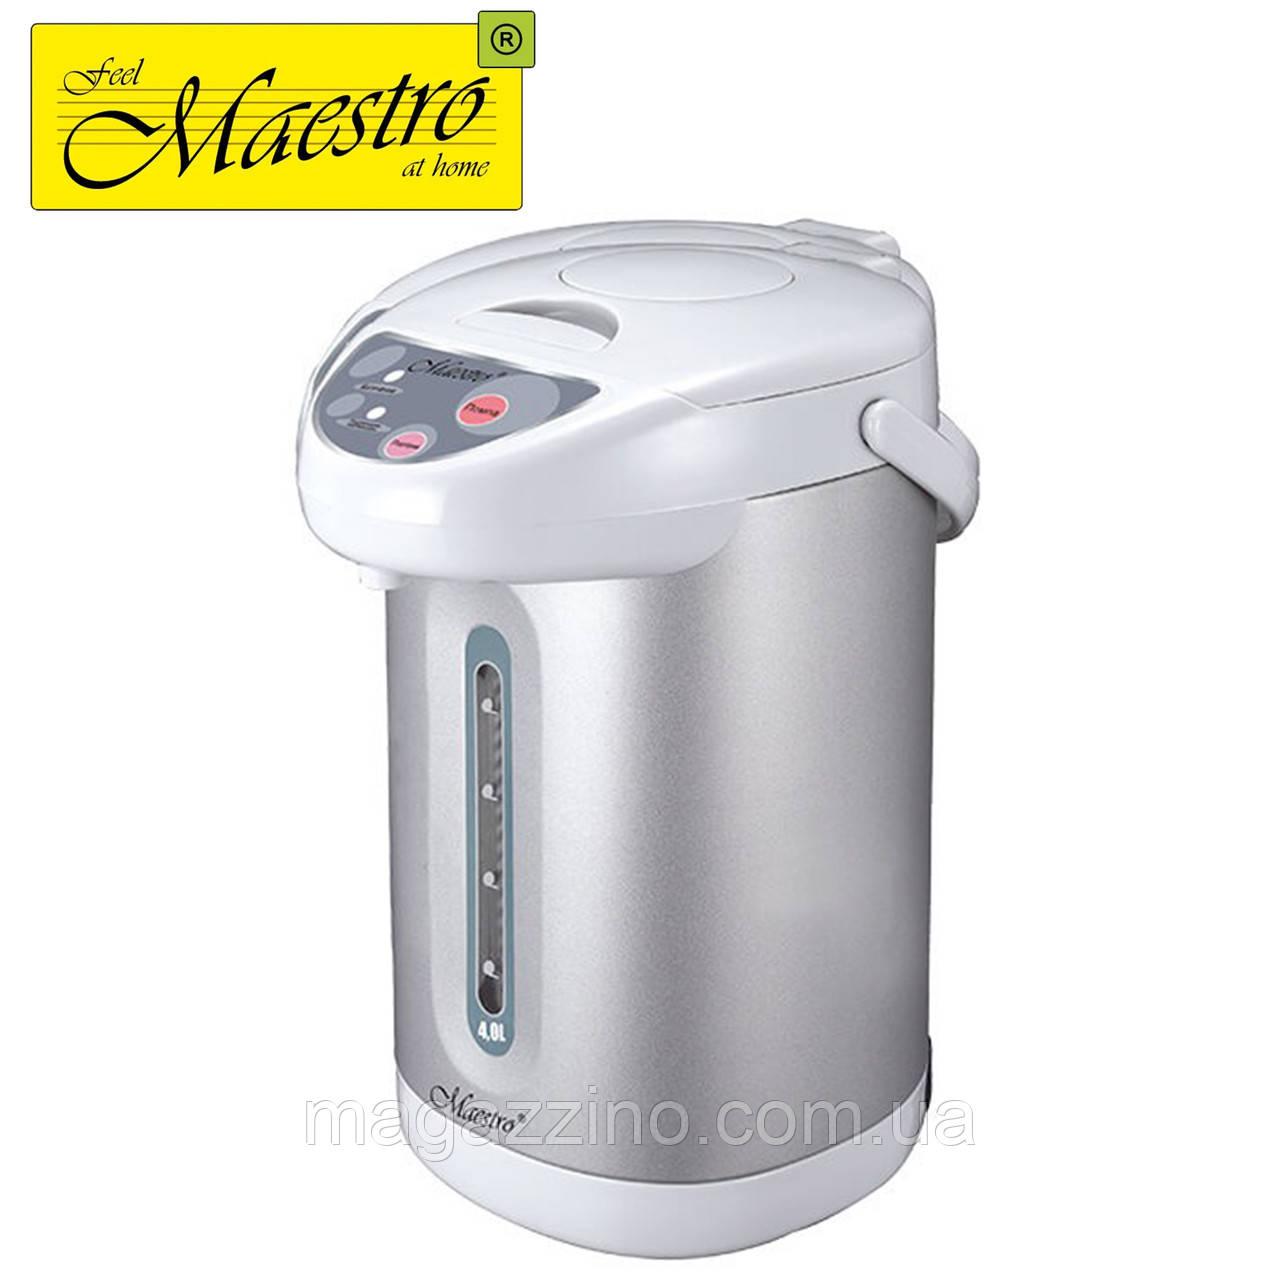 Термопот, чайник-термос Maestro MR-082, 3,3 л, 750 Вт.